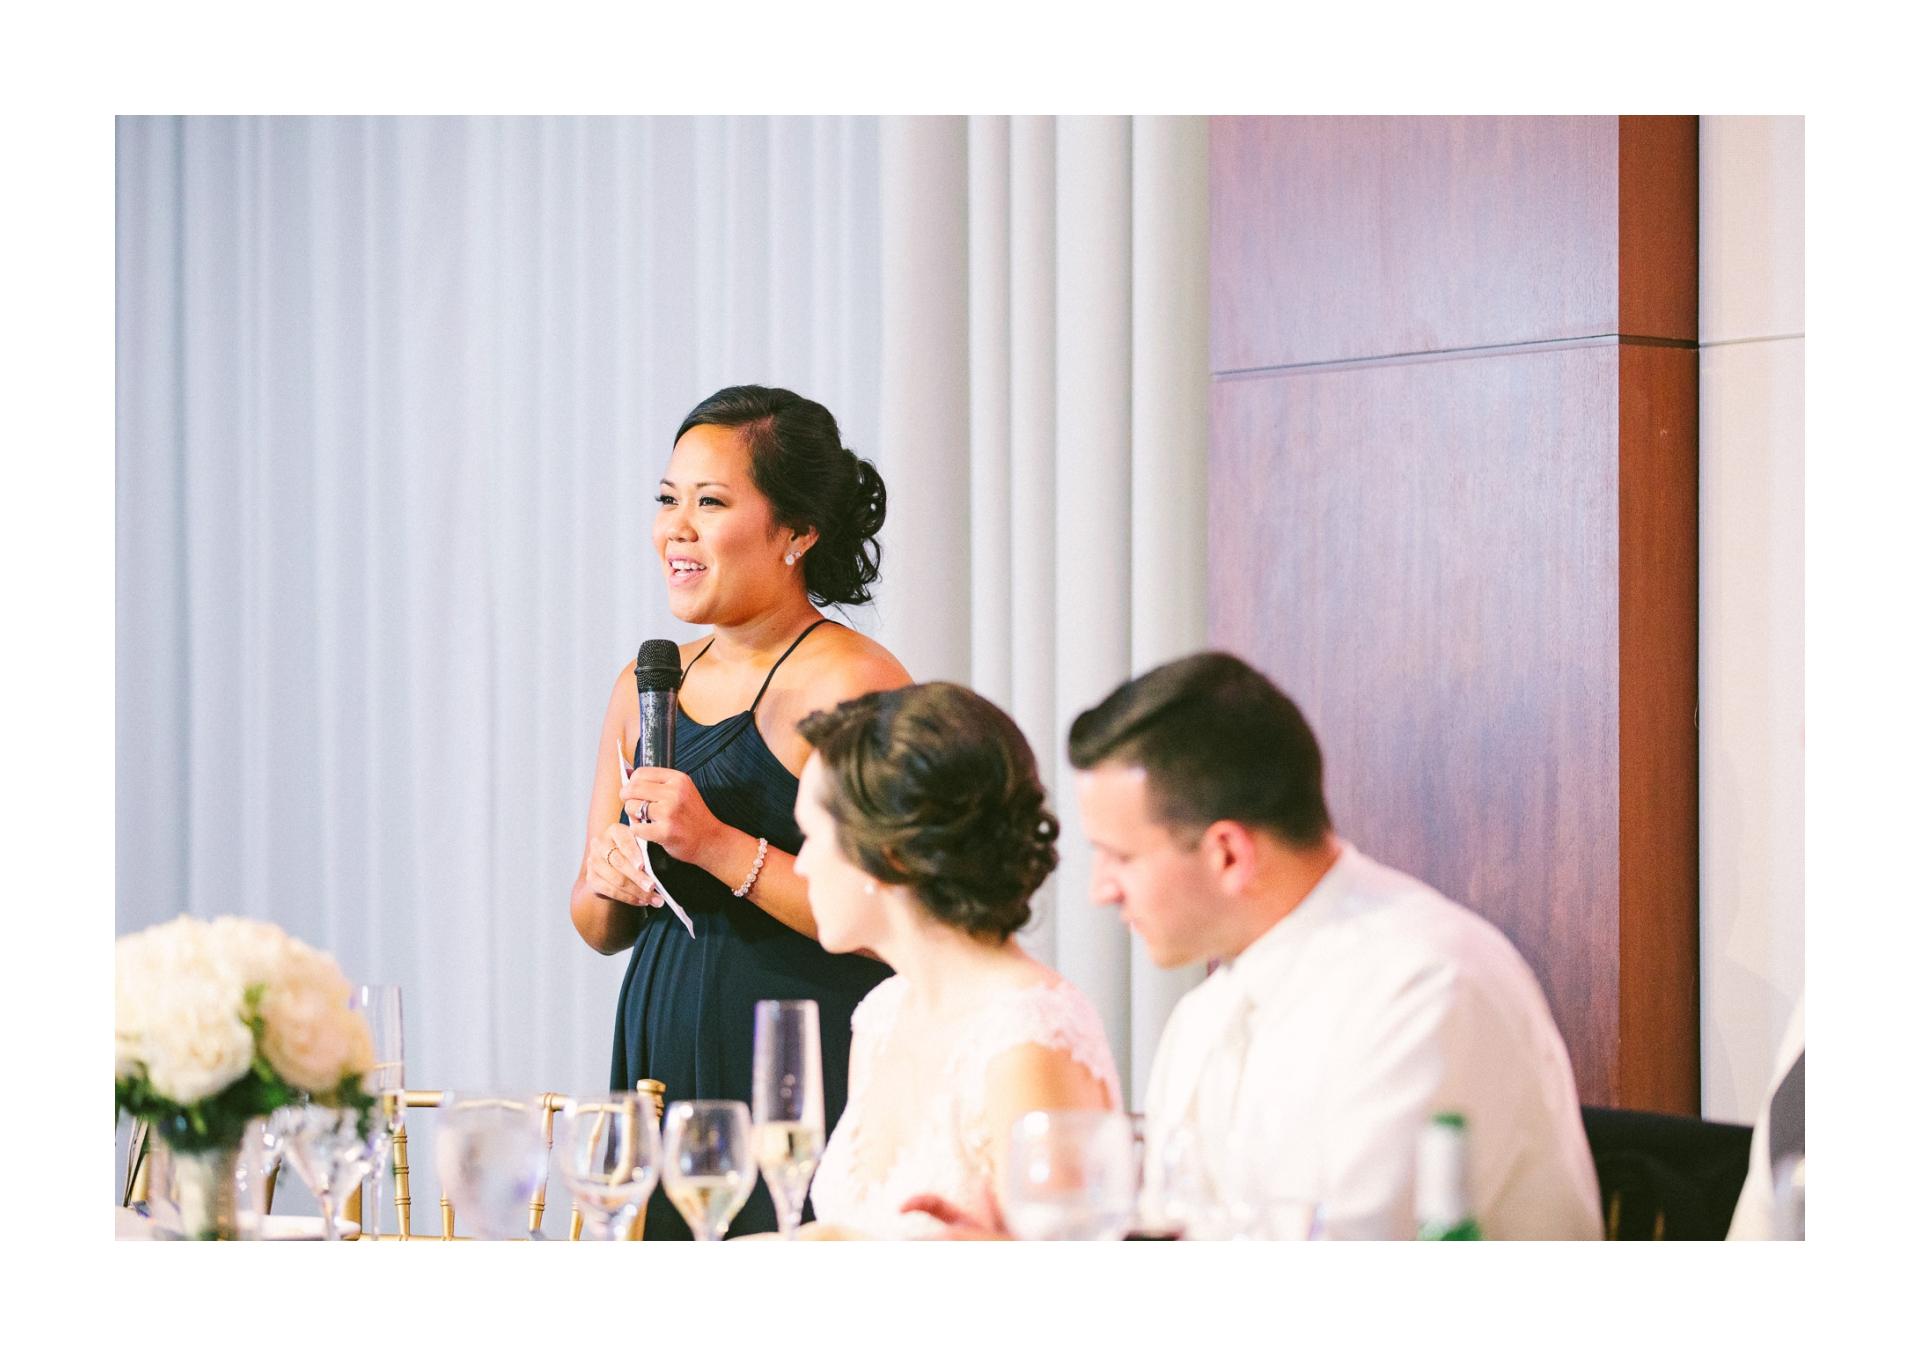 Intercontinental Hotel Wedding in Cleveland 2 36.jpg